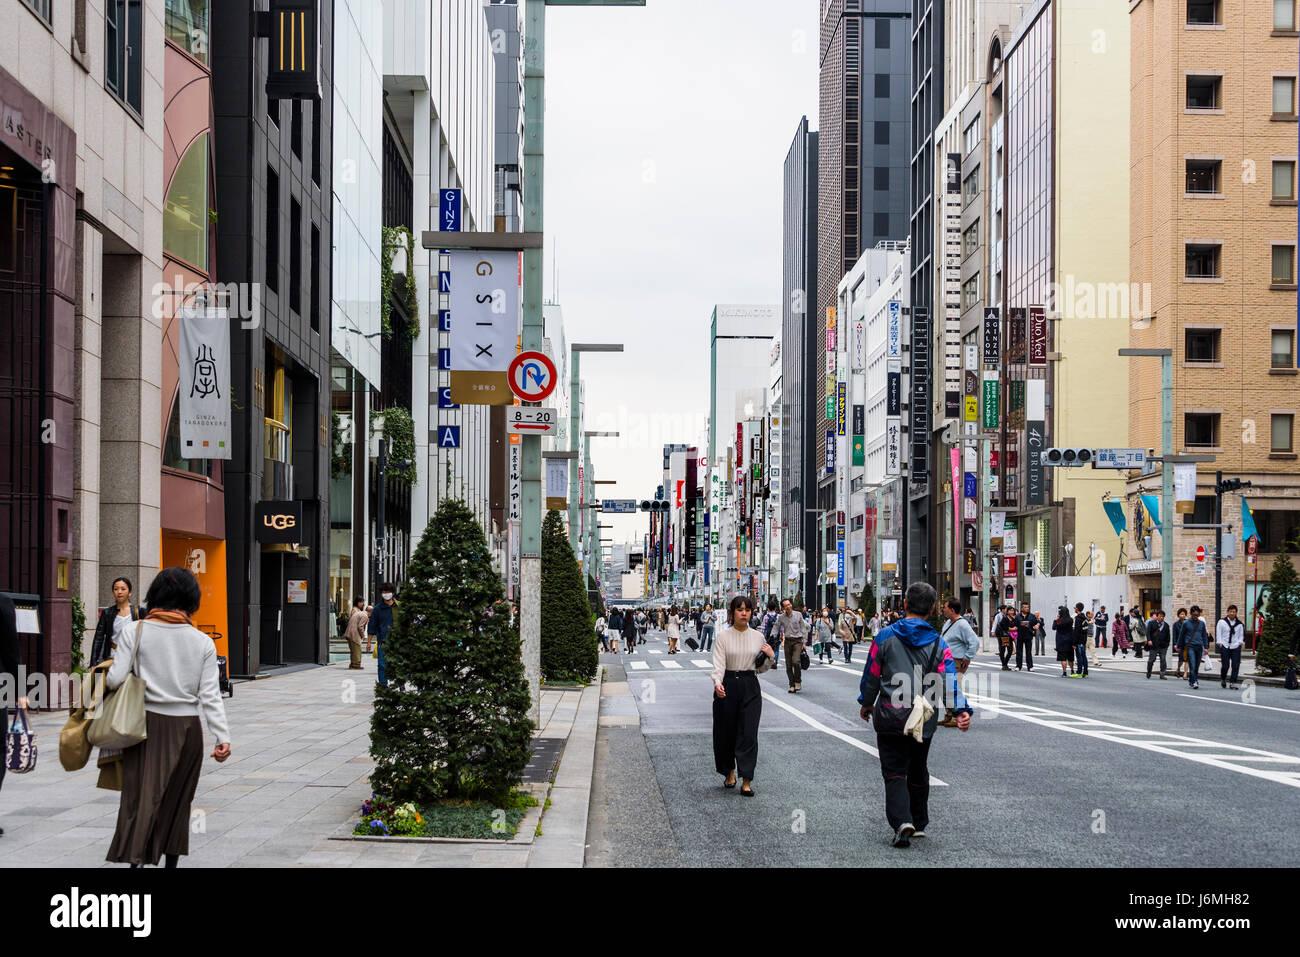 Chuo Dori street, Ginza. Pedestrianized shopping.Tokyo, Japan. - Stock Image